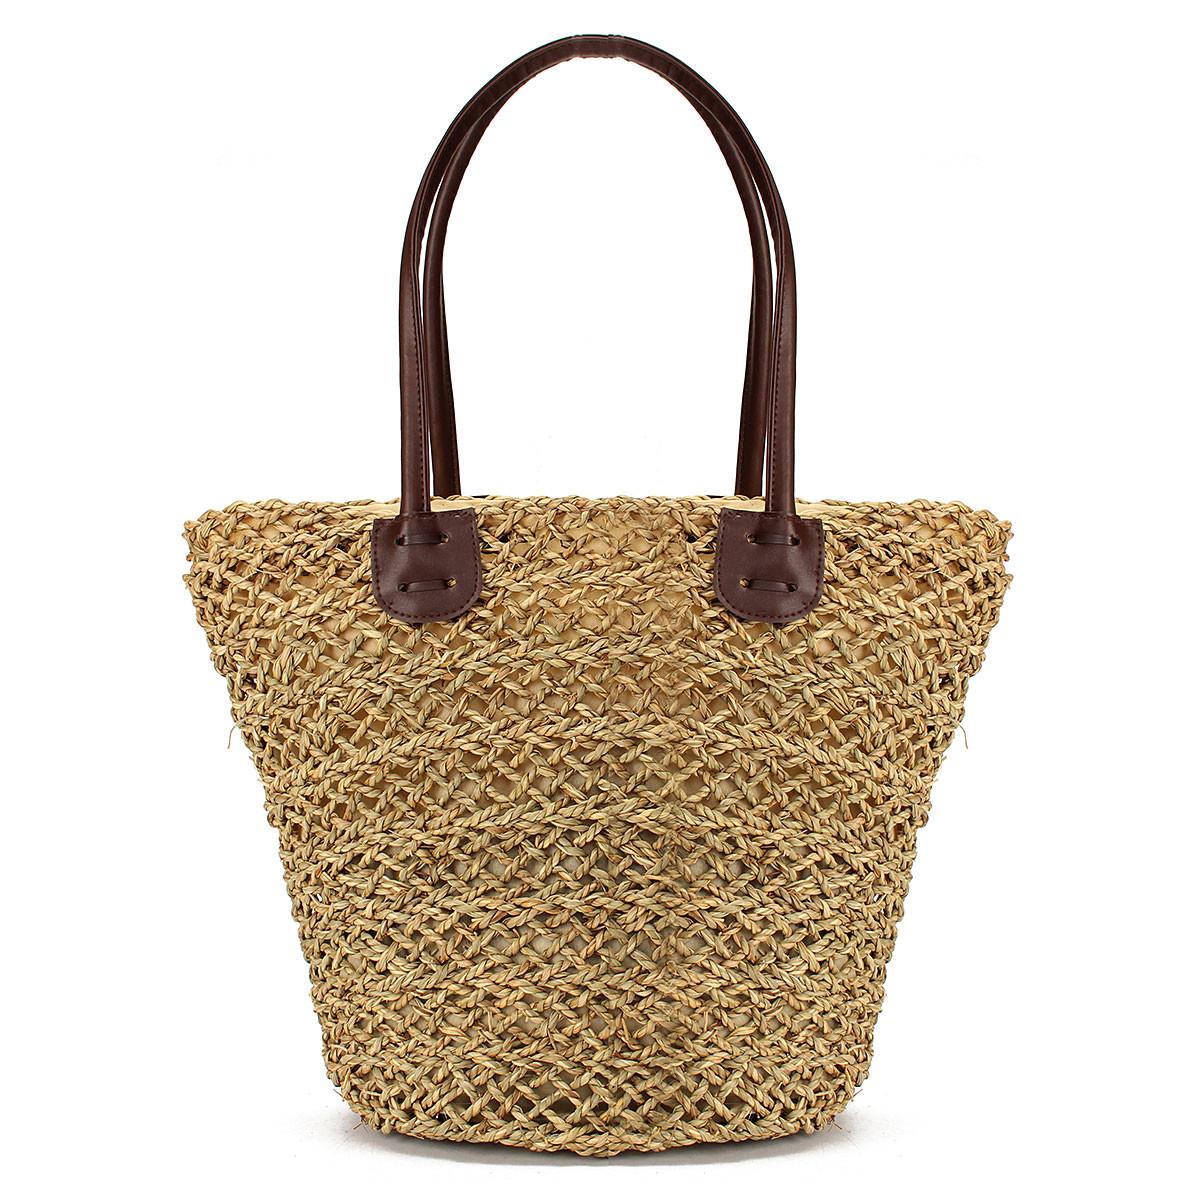 femme sac main epaule cabas paille tress shopping plage fourre tout achat vente femme sac. Black Bedroom Furniture Sets. Home Design Ideas